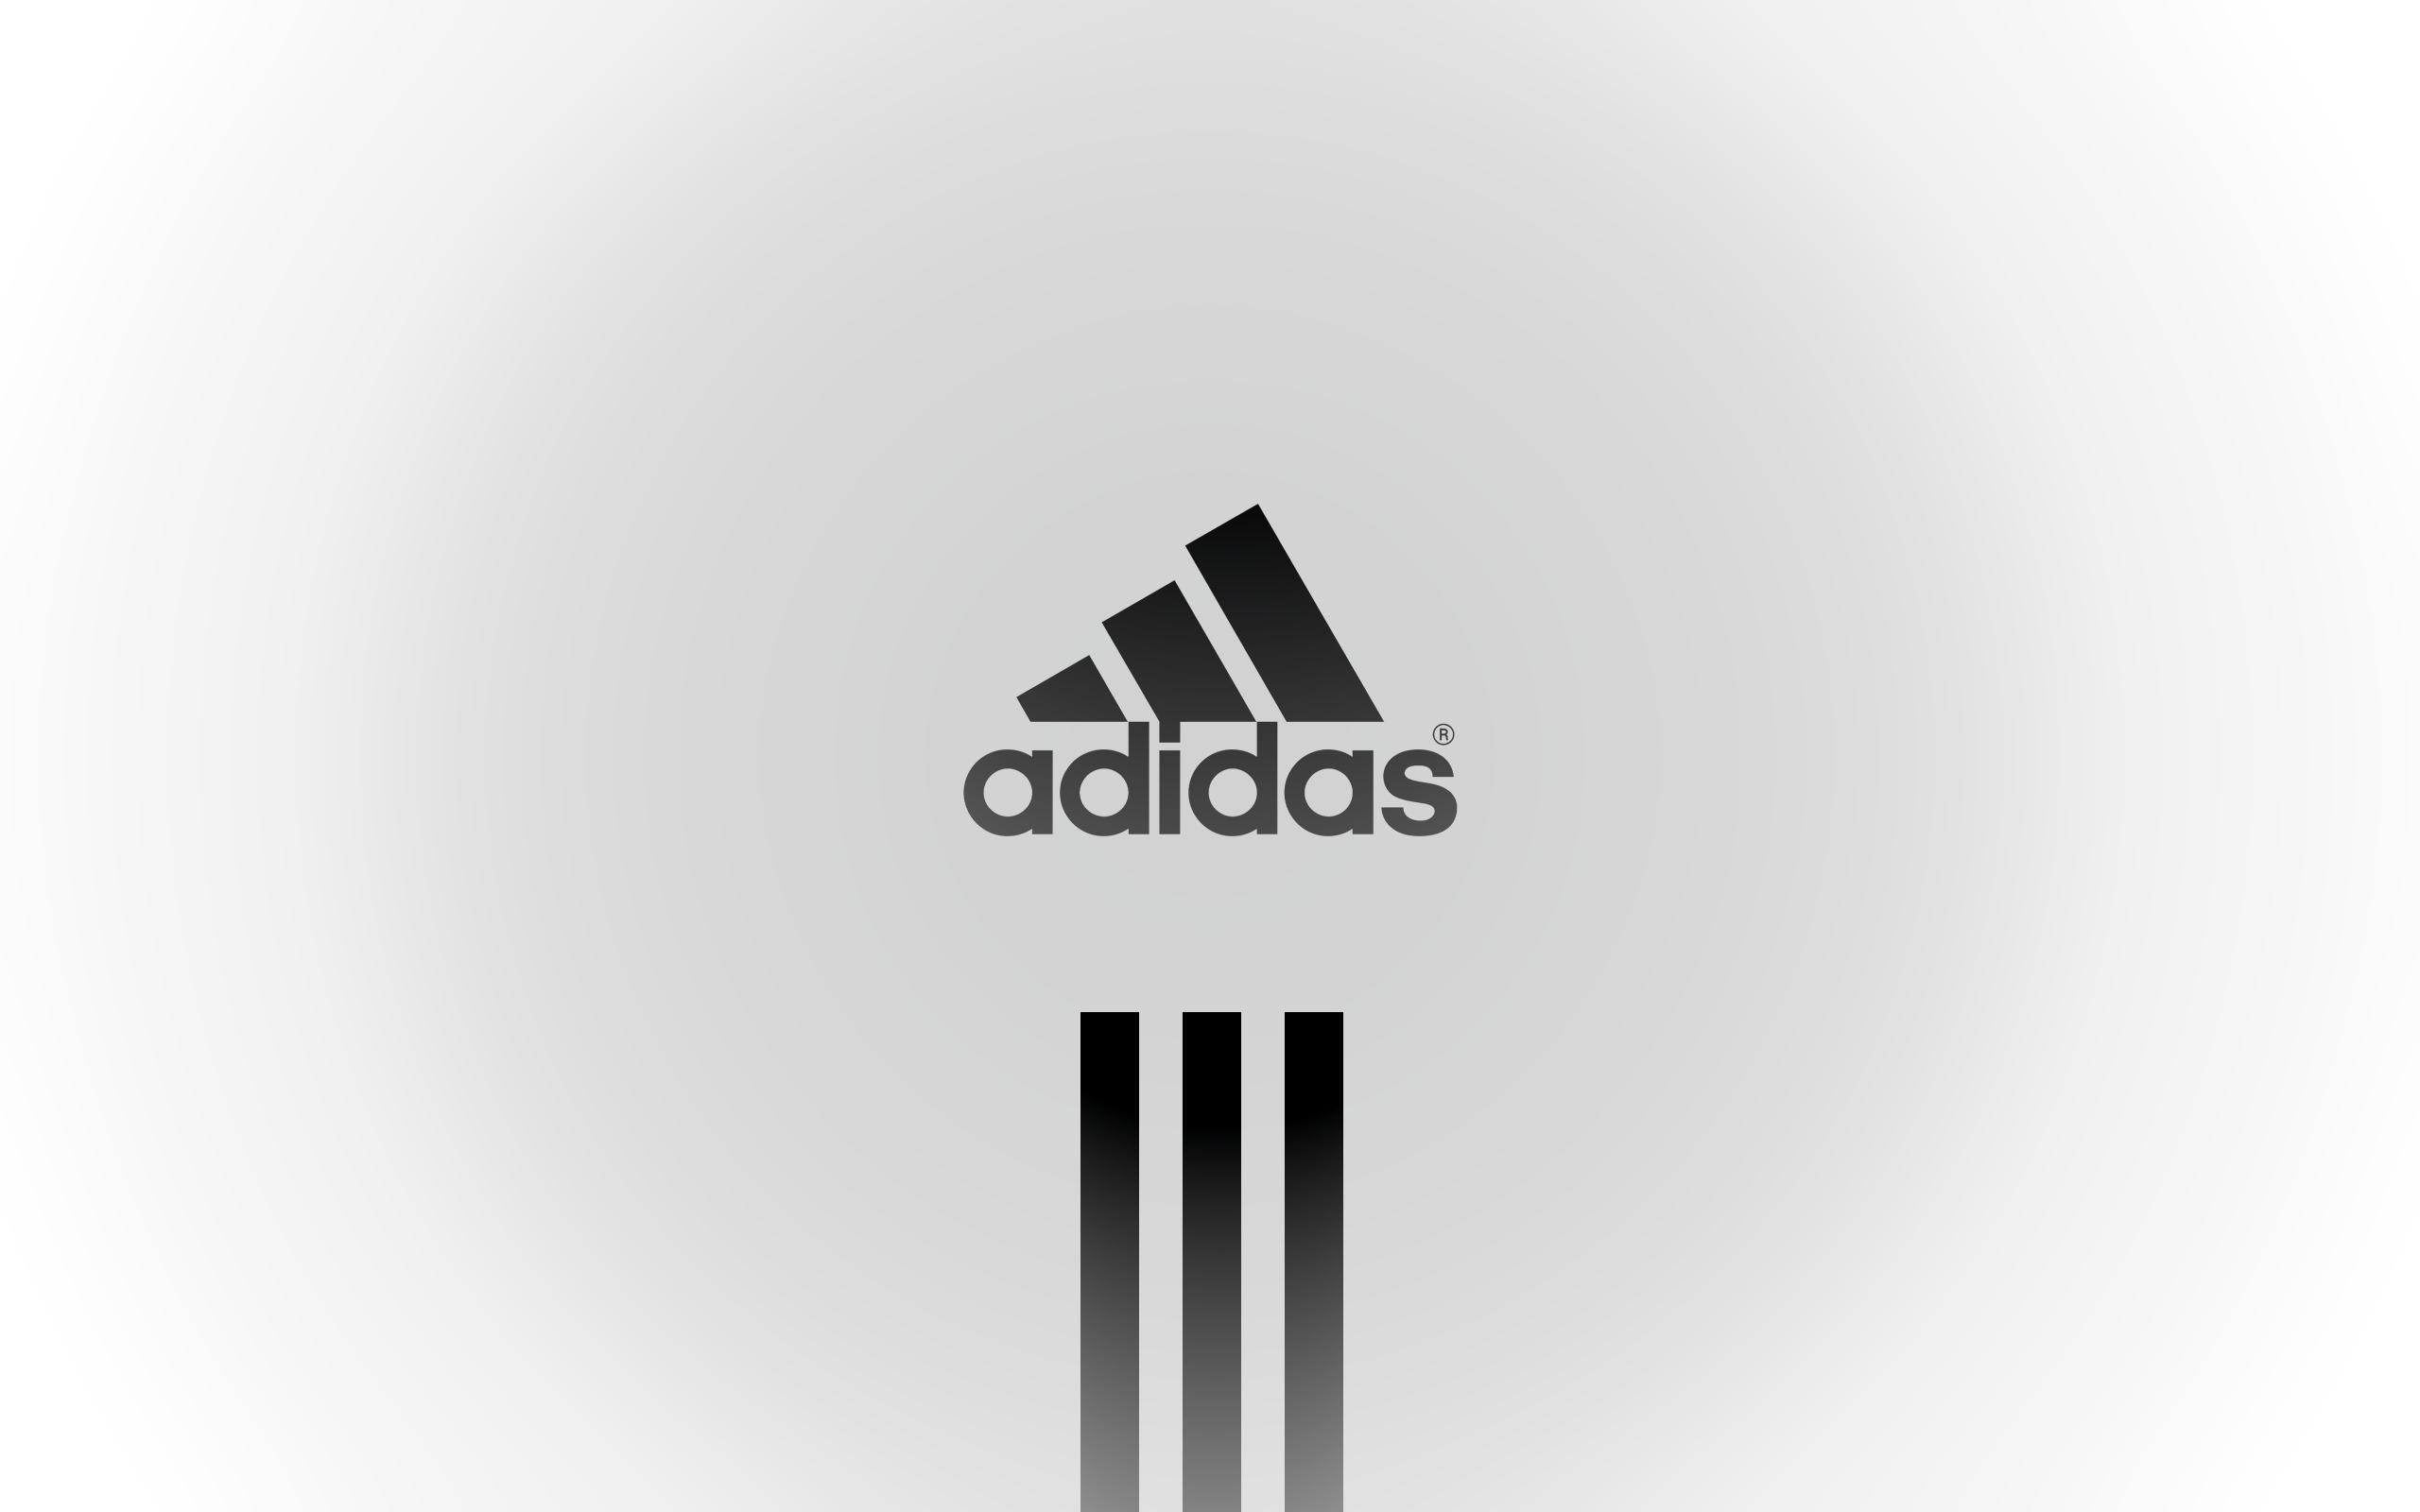 Adidas Logo Simple Wallpapers Hd 13 Backgrounds Wfz Fondos De Pantalla Hd Logo De La Marca Pantalla